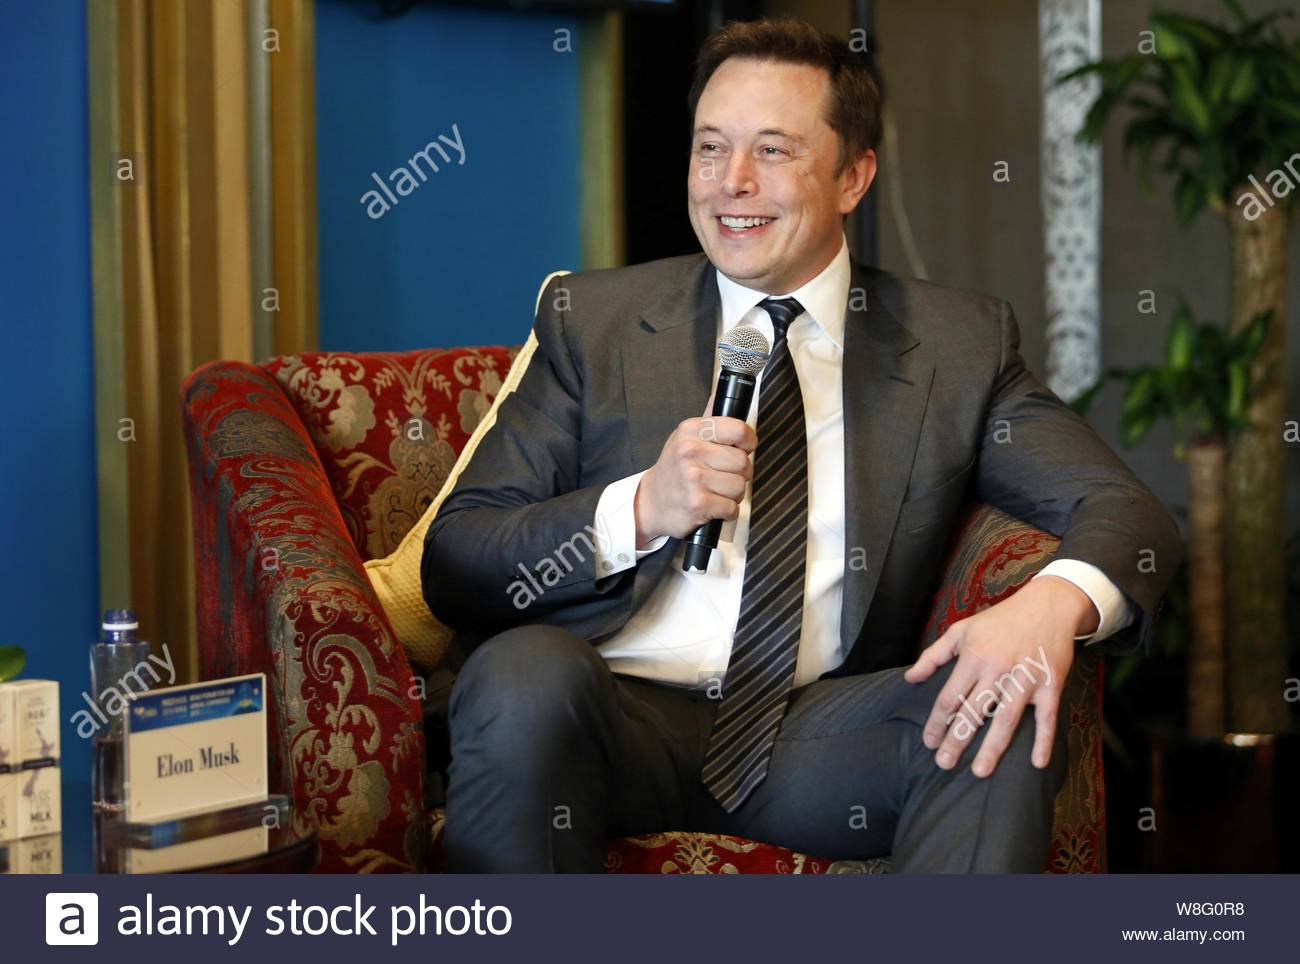 Elon Stock Photos & Elon Stock Images - Page 3 - Alamy